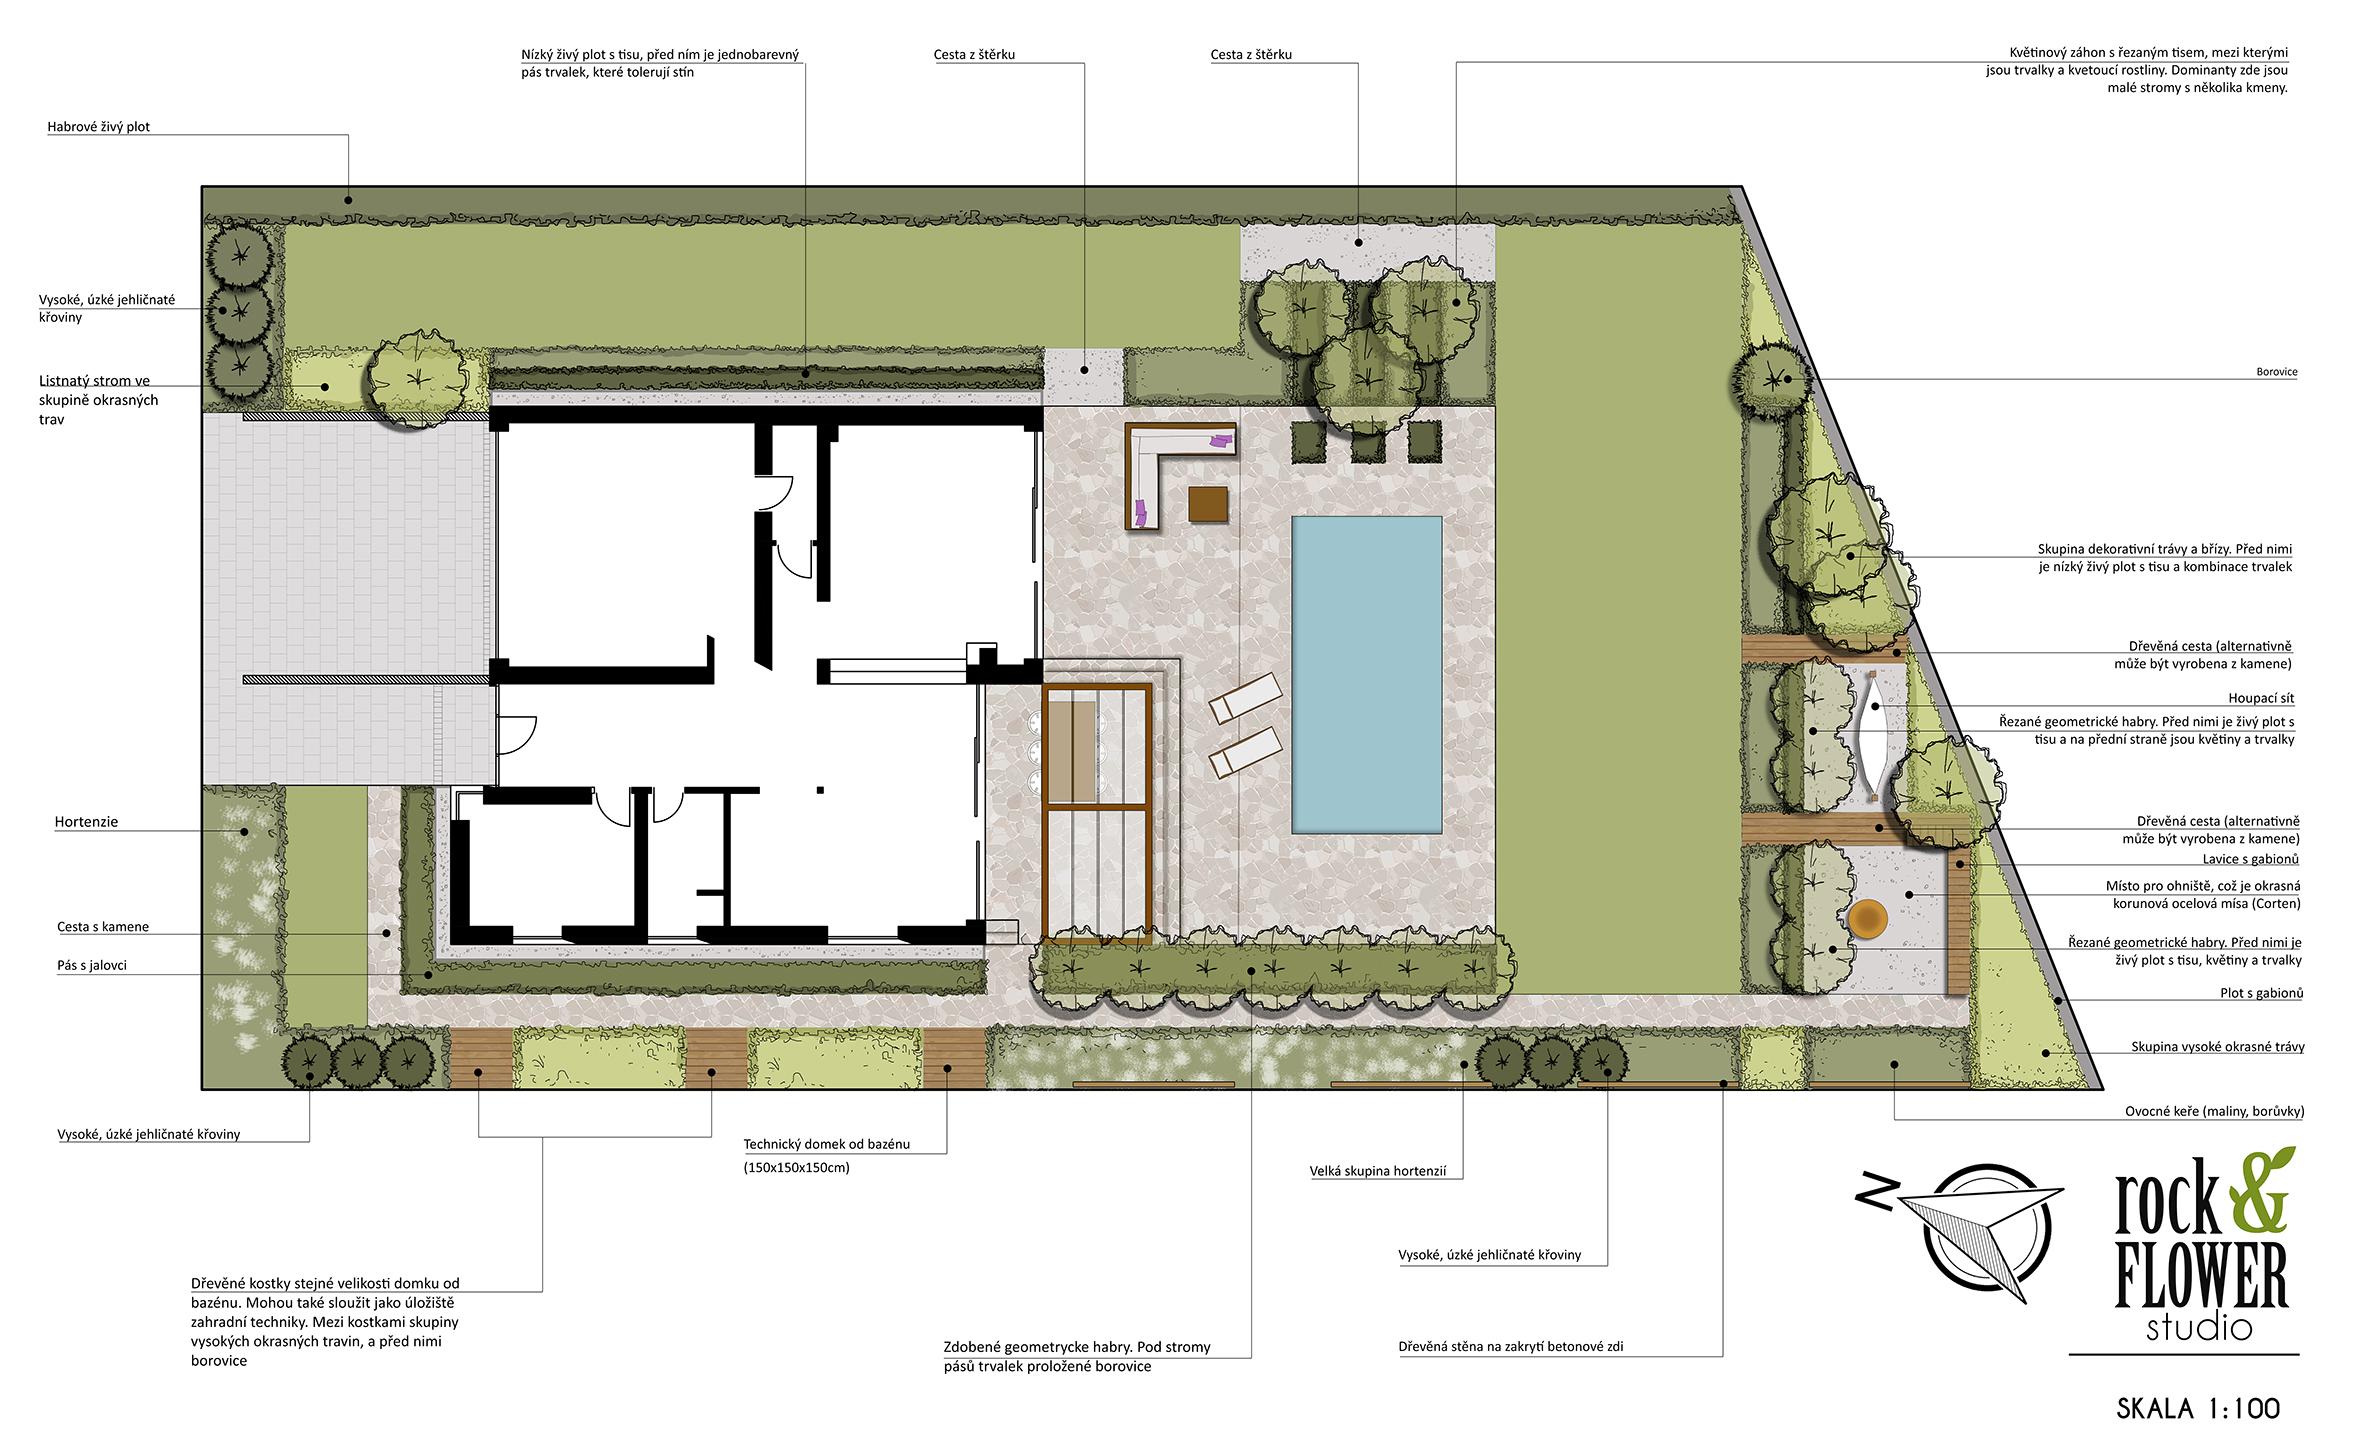 zahrada-s-bazenem-praha-navrhzahrady-rockandflowerstudio